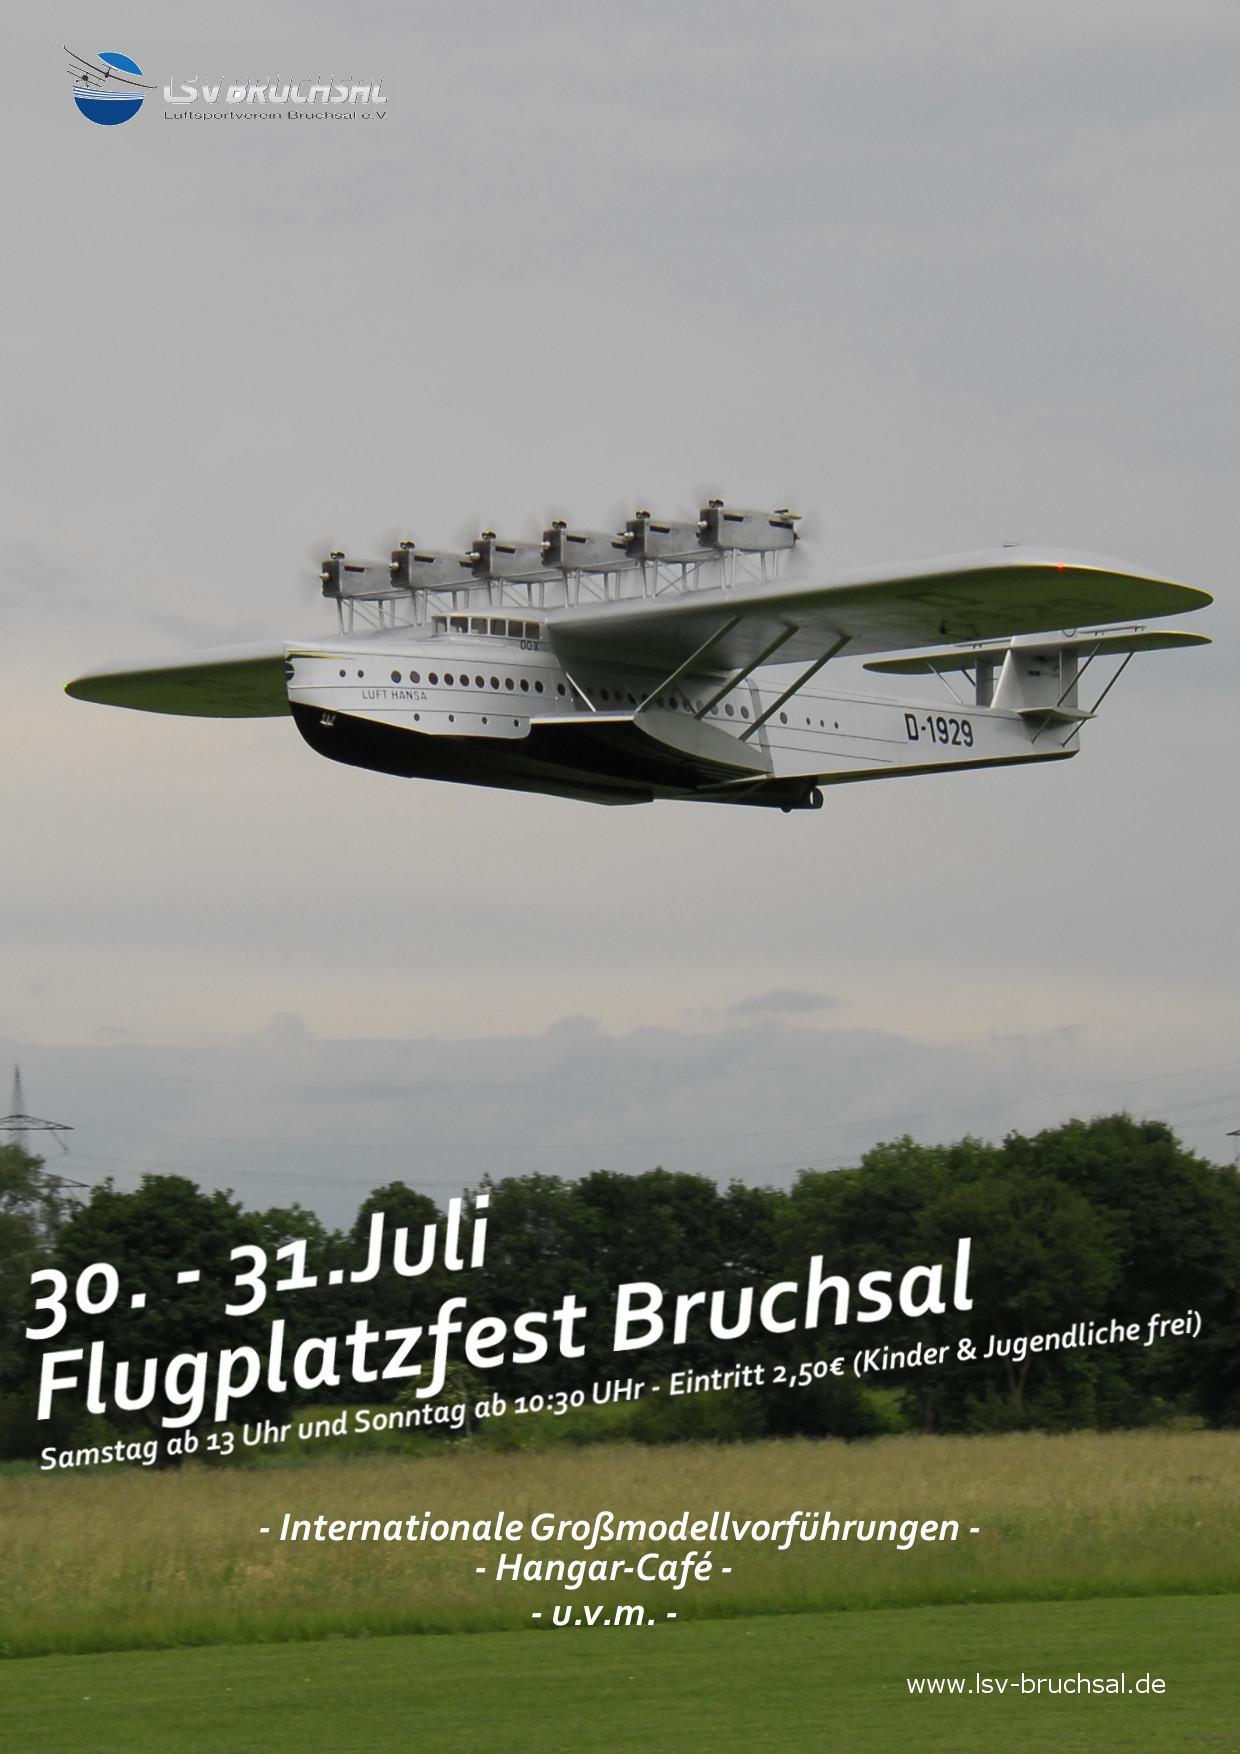 Flugplatzfest Luftsportverein (LSV) Bruchsal e.V.